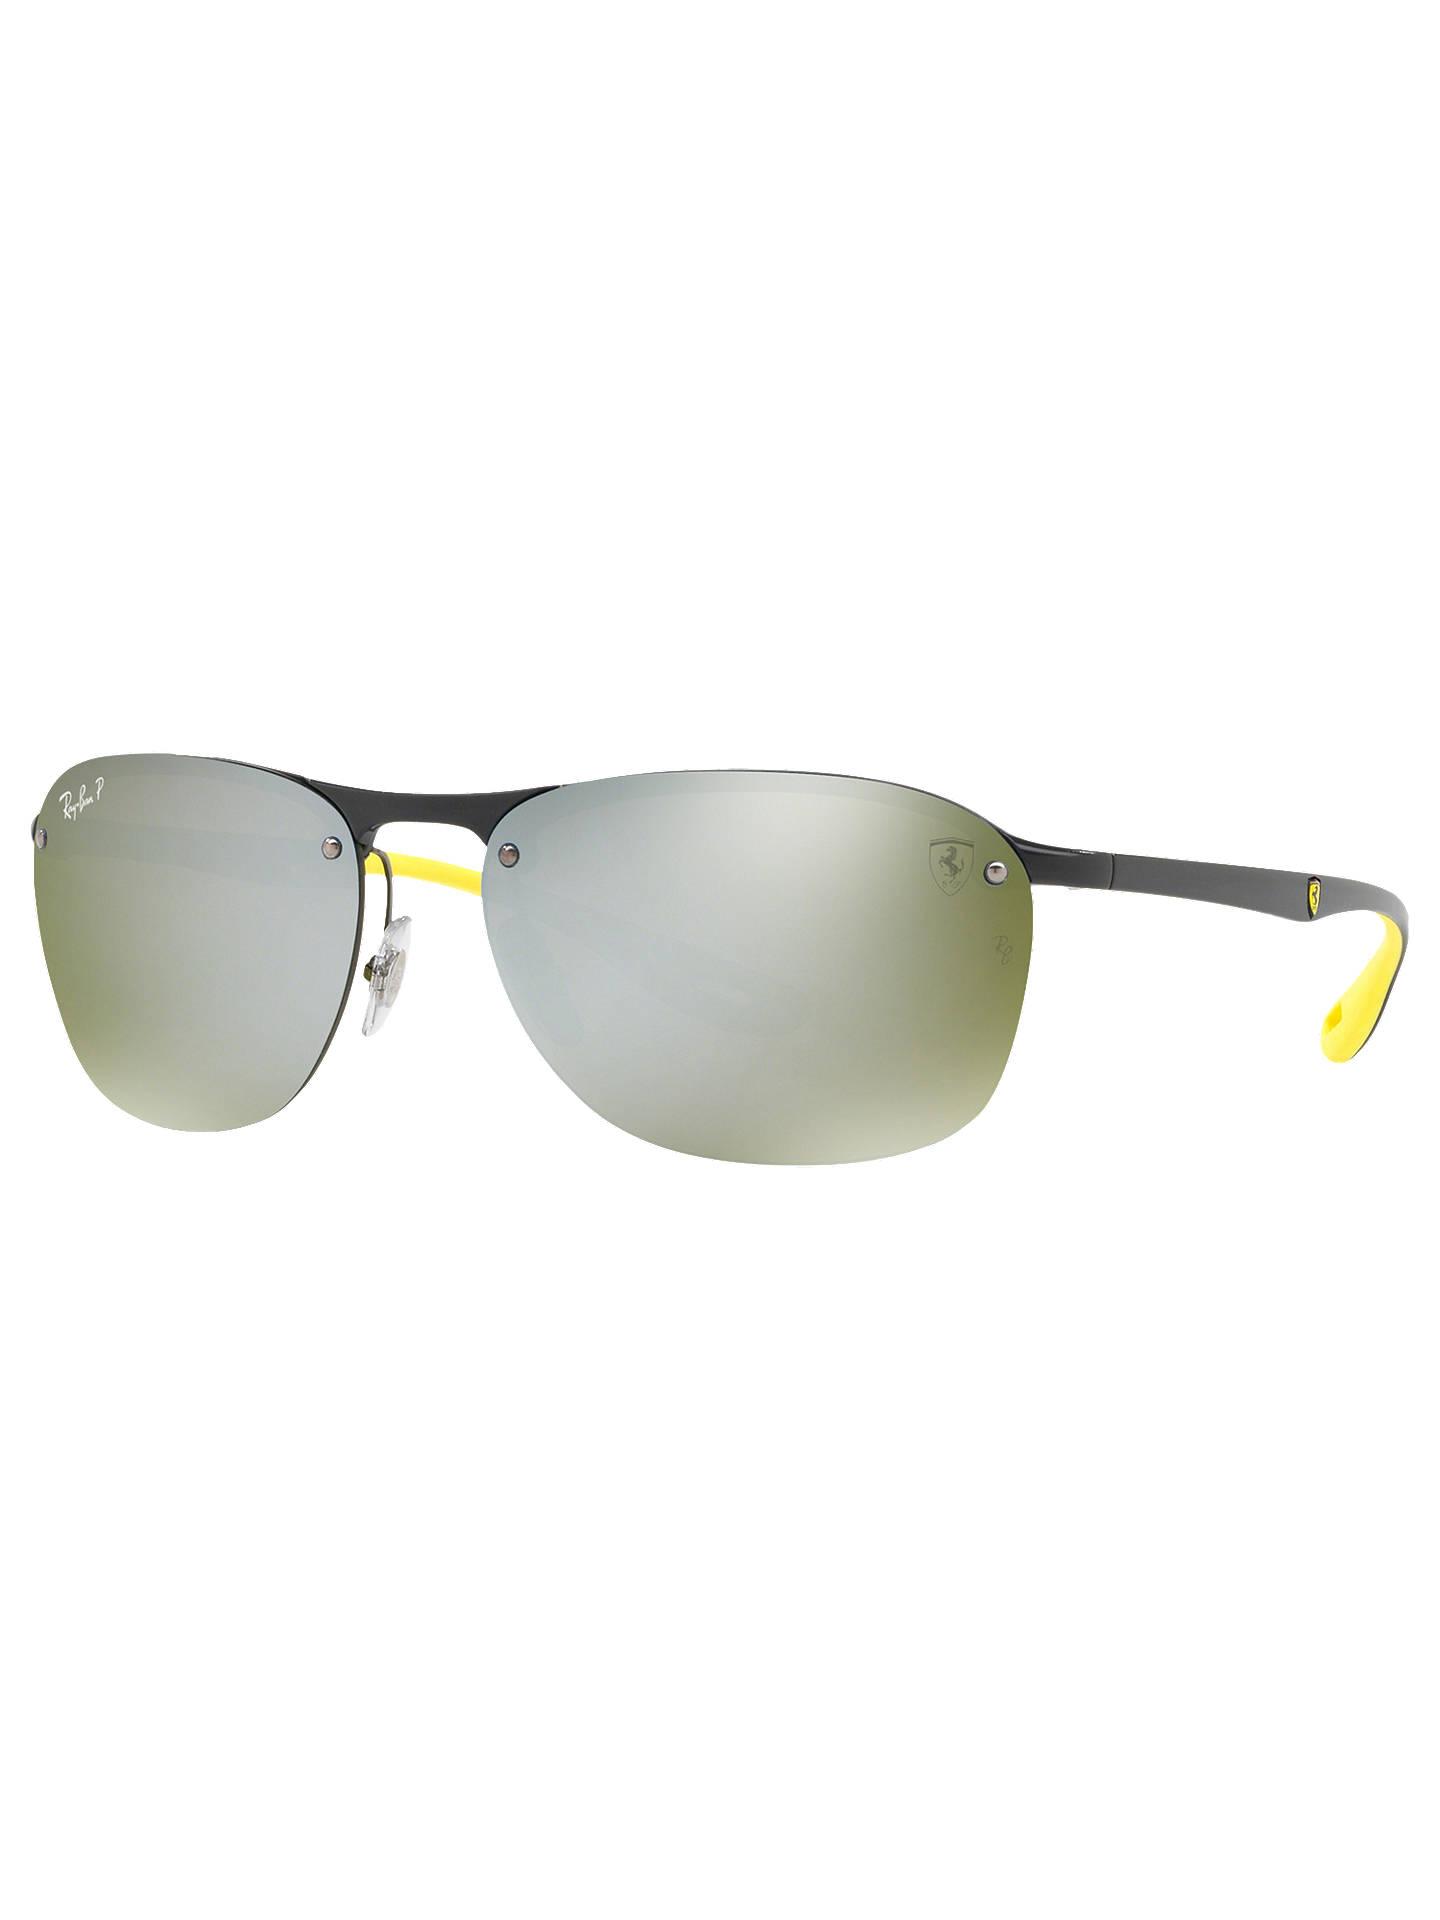 d026c9fa52 BuyRay-Ban RB4302M Men s Scuderia Ferrari Collection Polarised Oval  Sunglasses